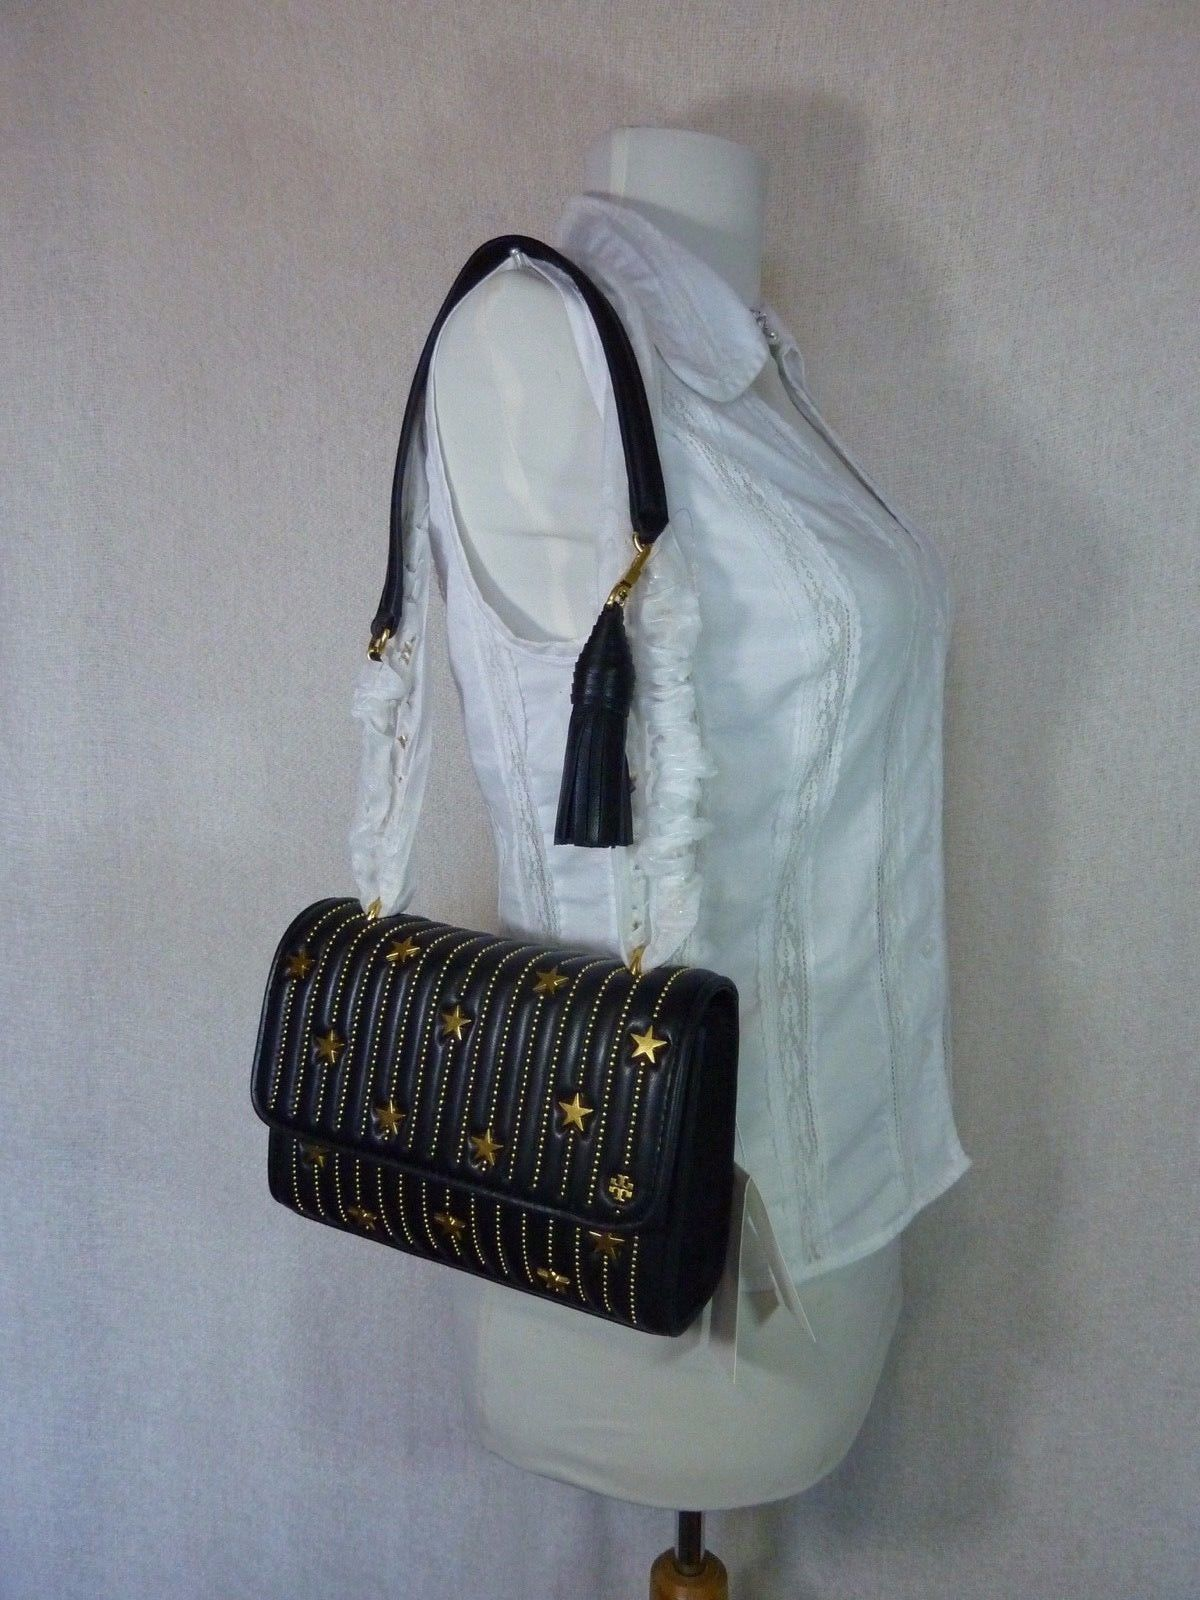 NWT Tory Burch Black Fleming Star-Stud Small Convertible Bag $558 image 11